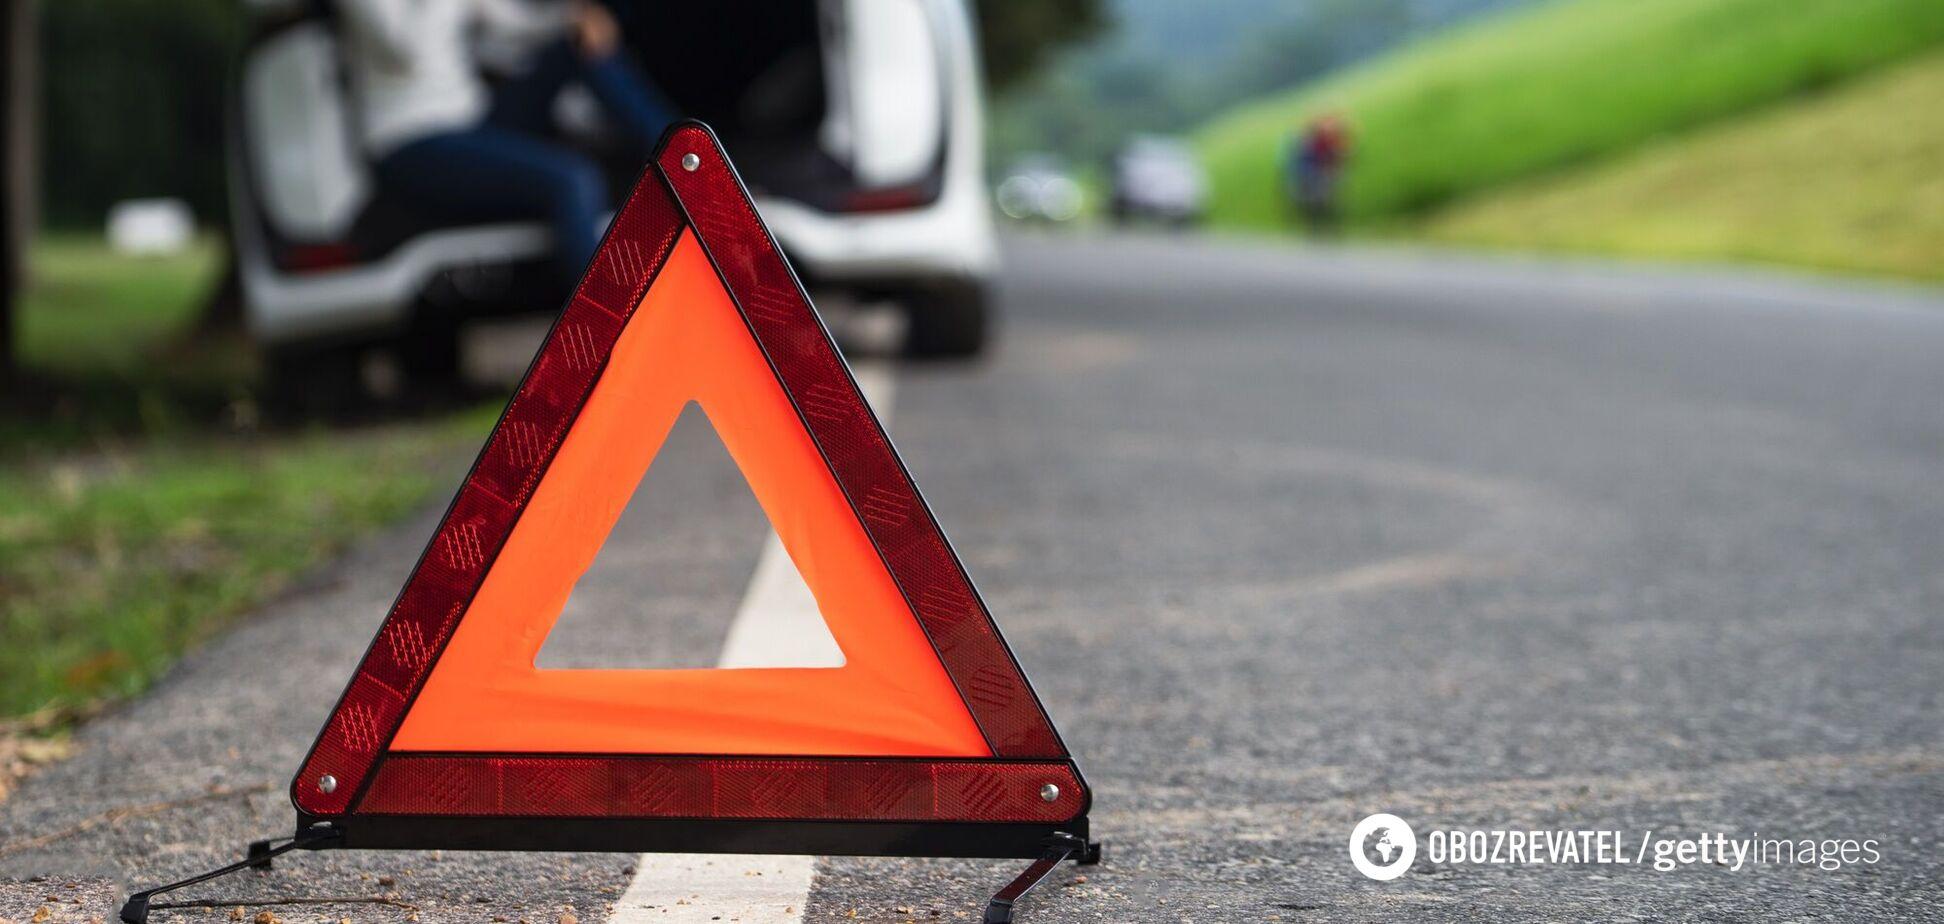 Детали аварии установят правоохранители